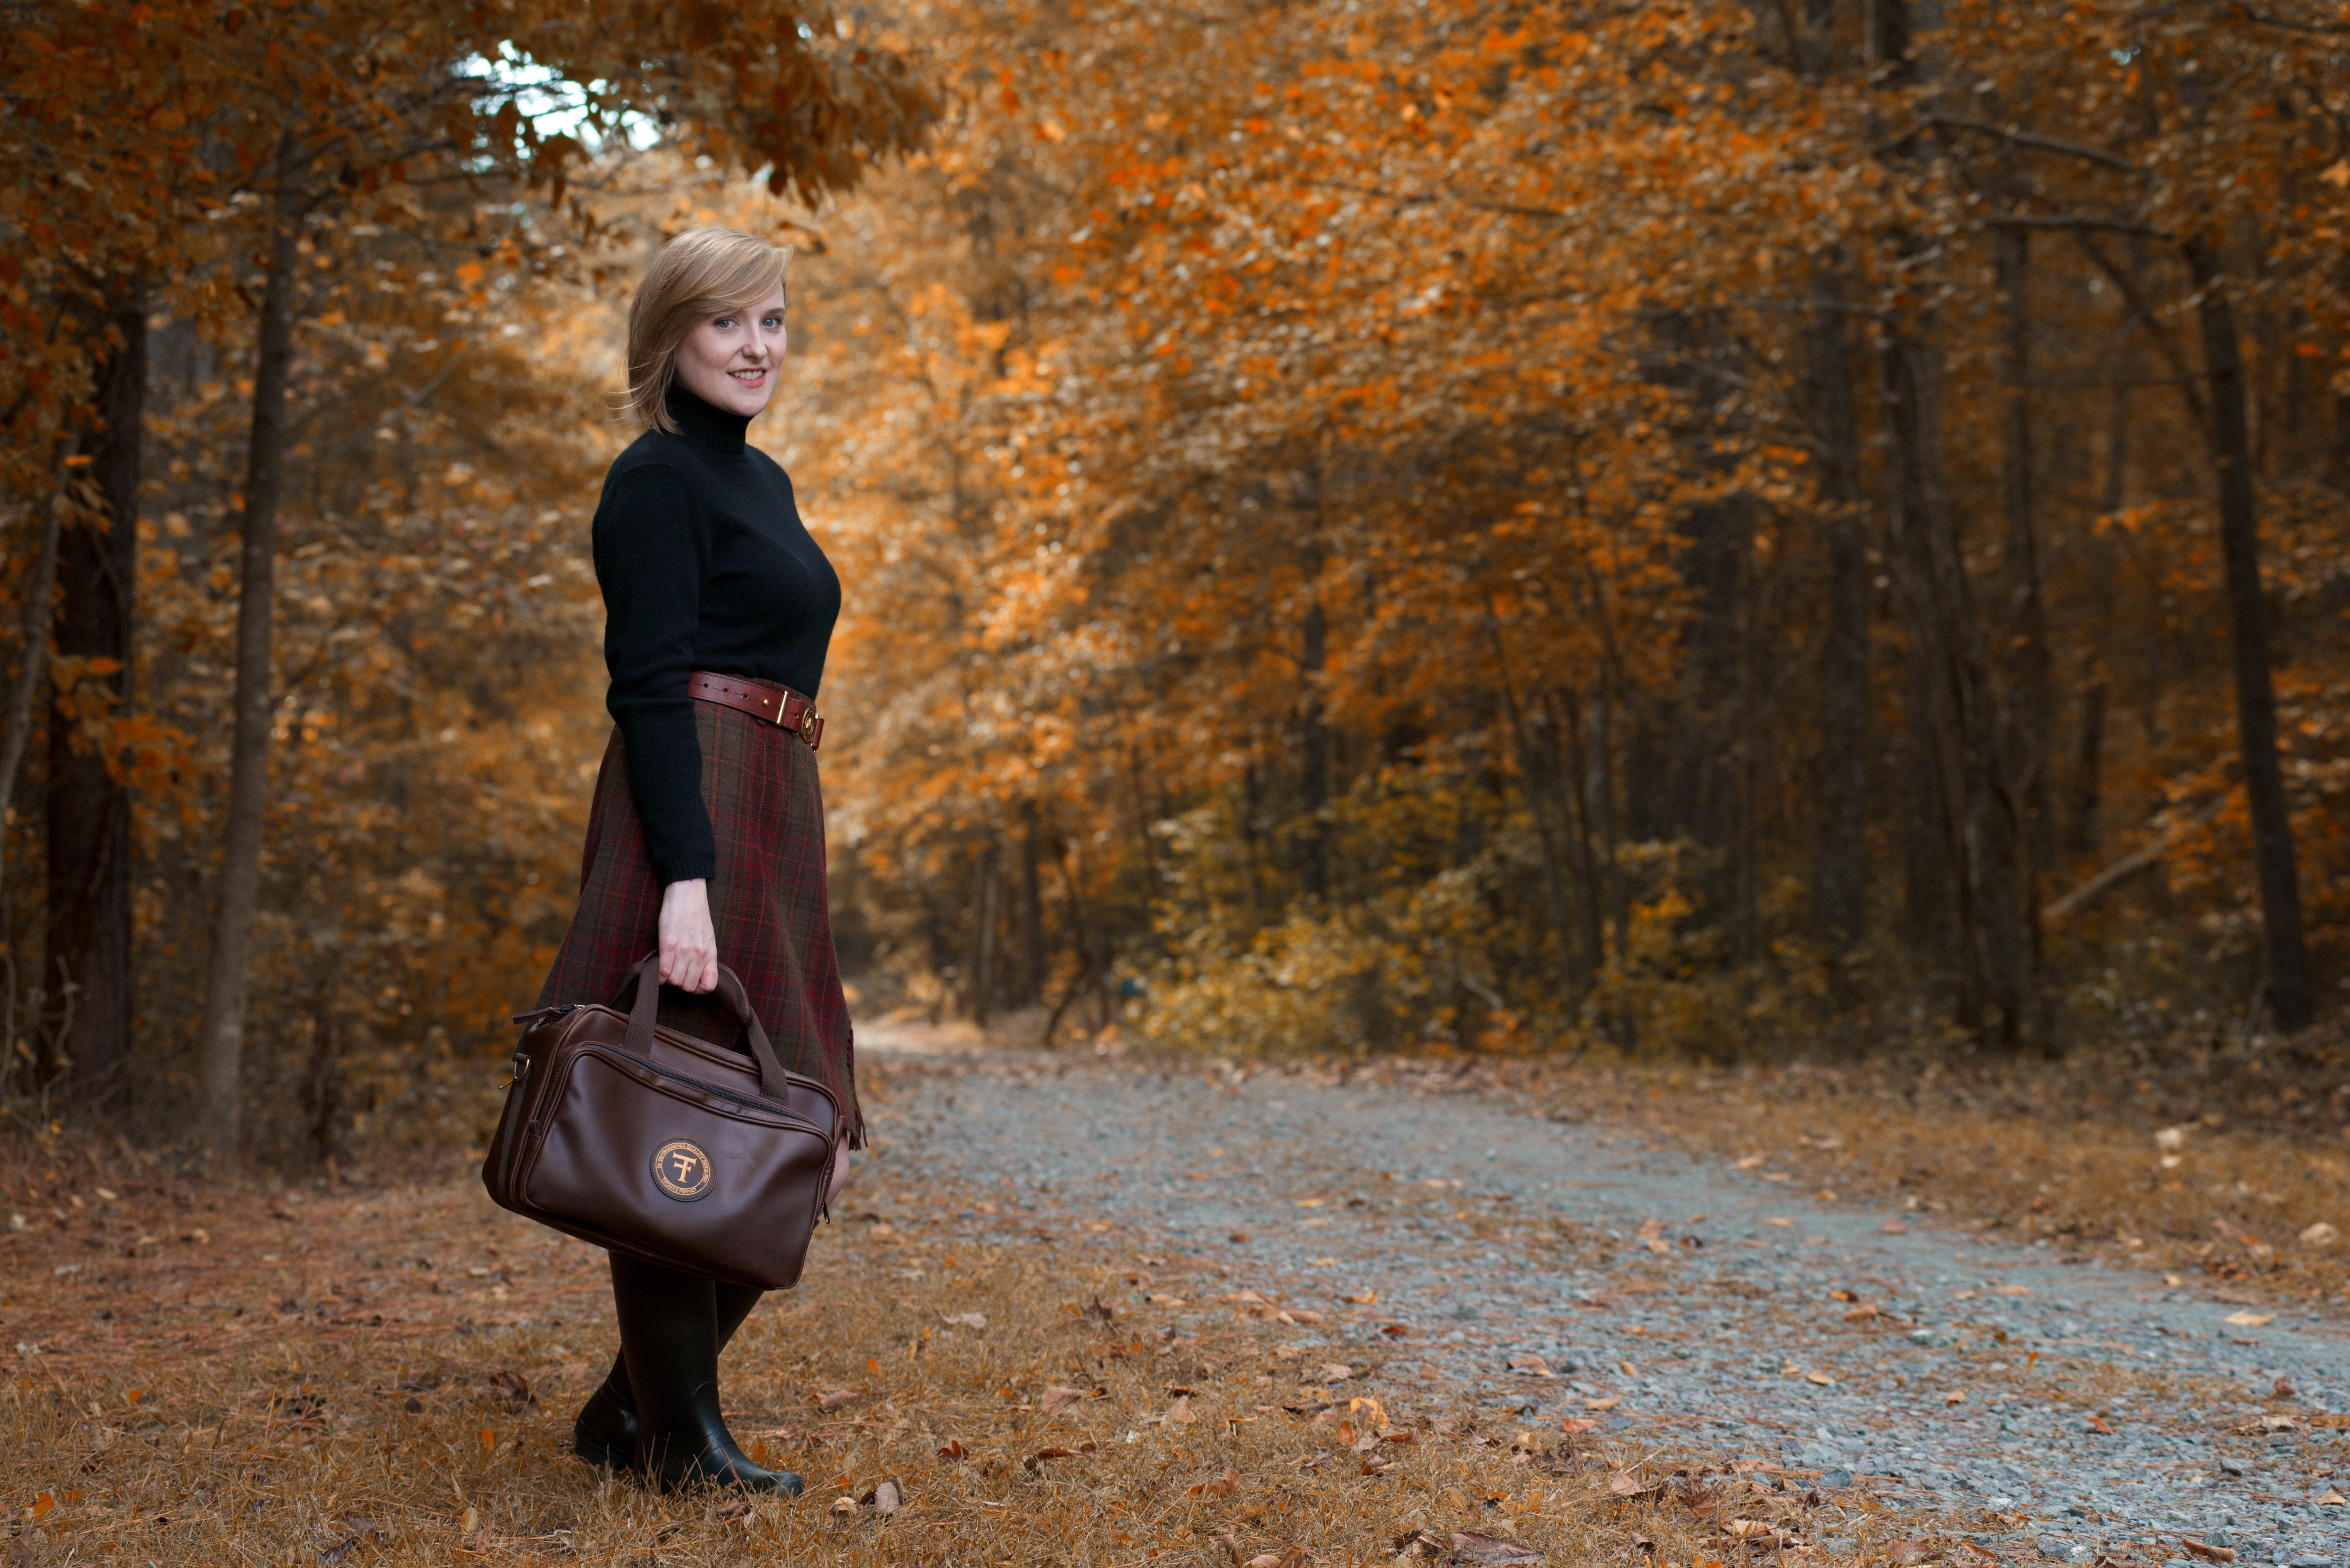 Leather-range-bag-gravel-road